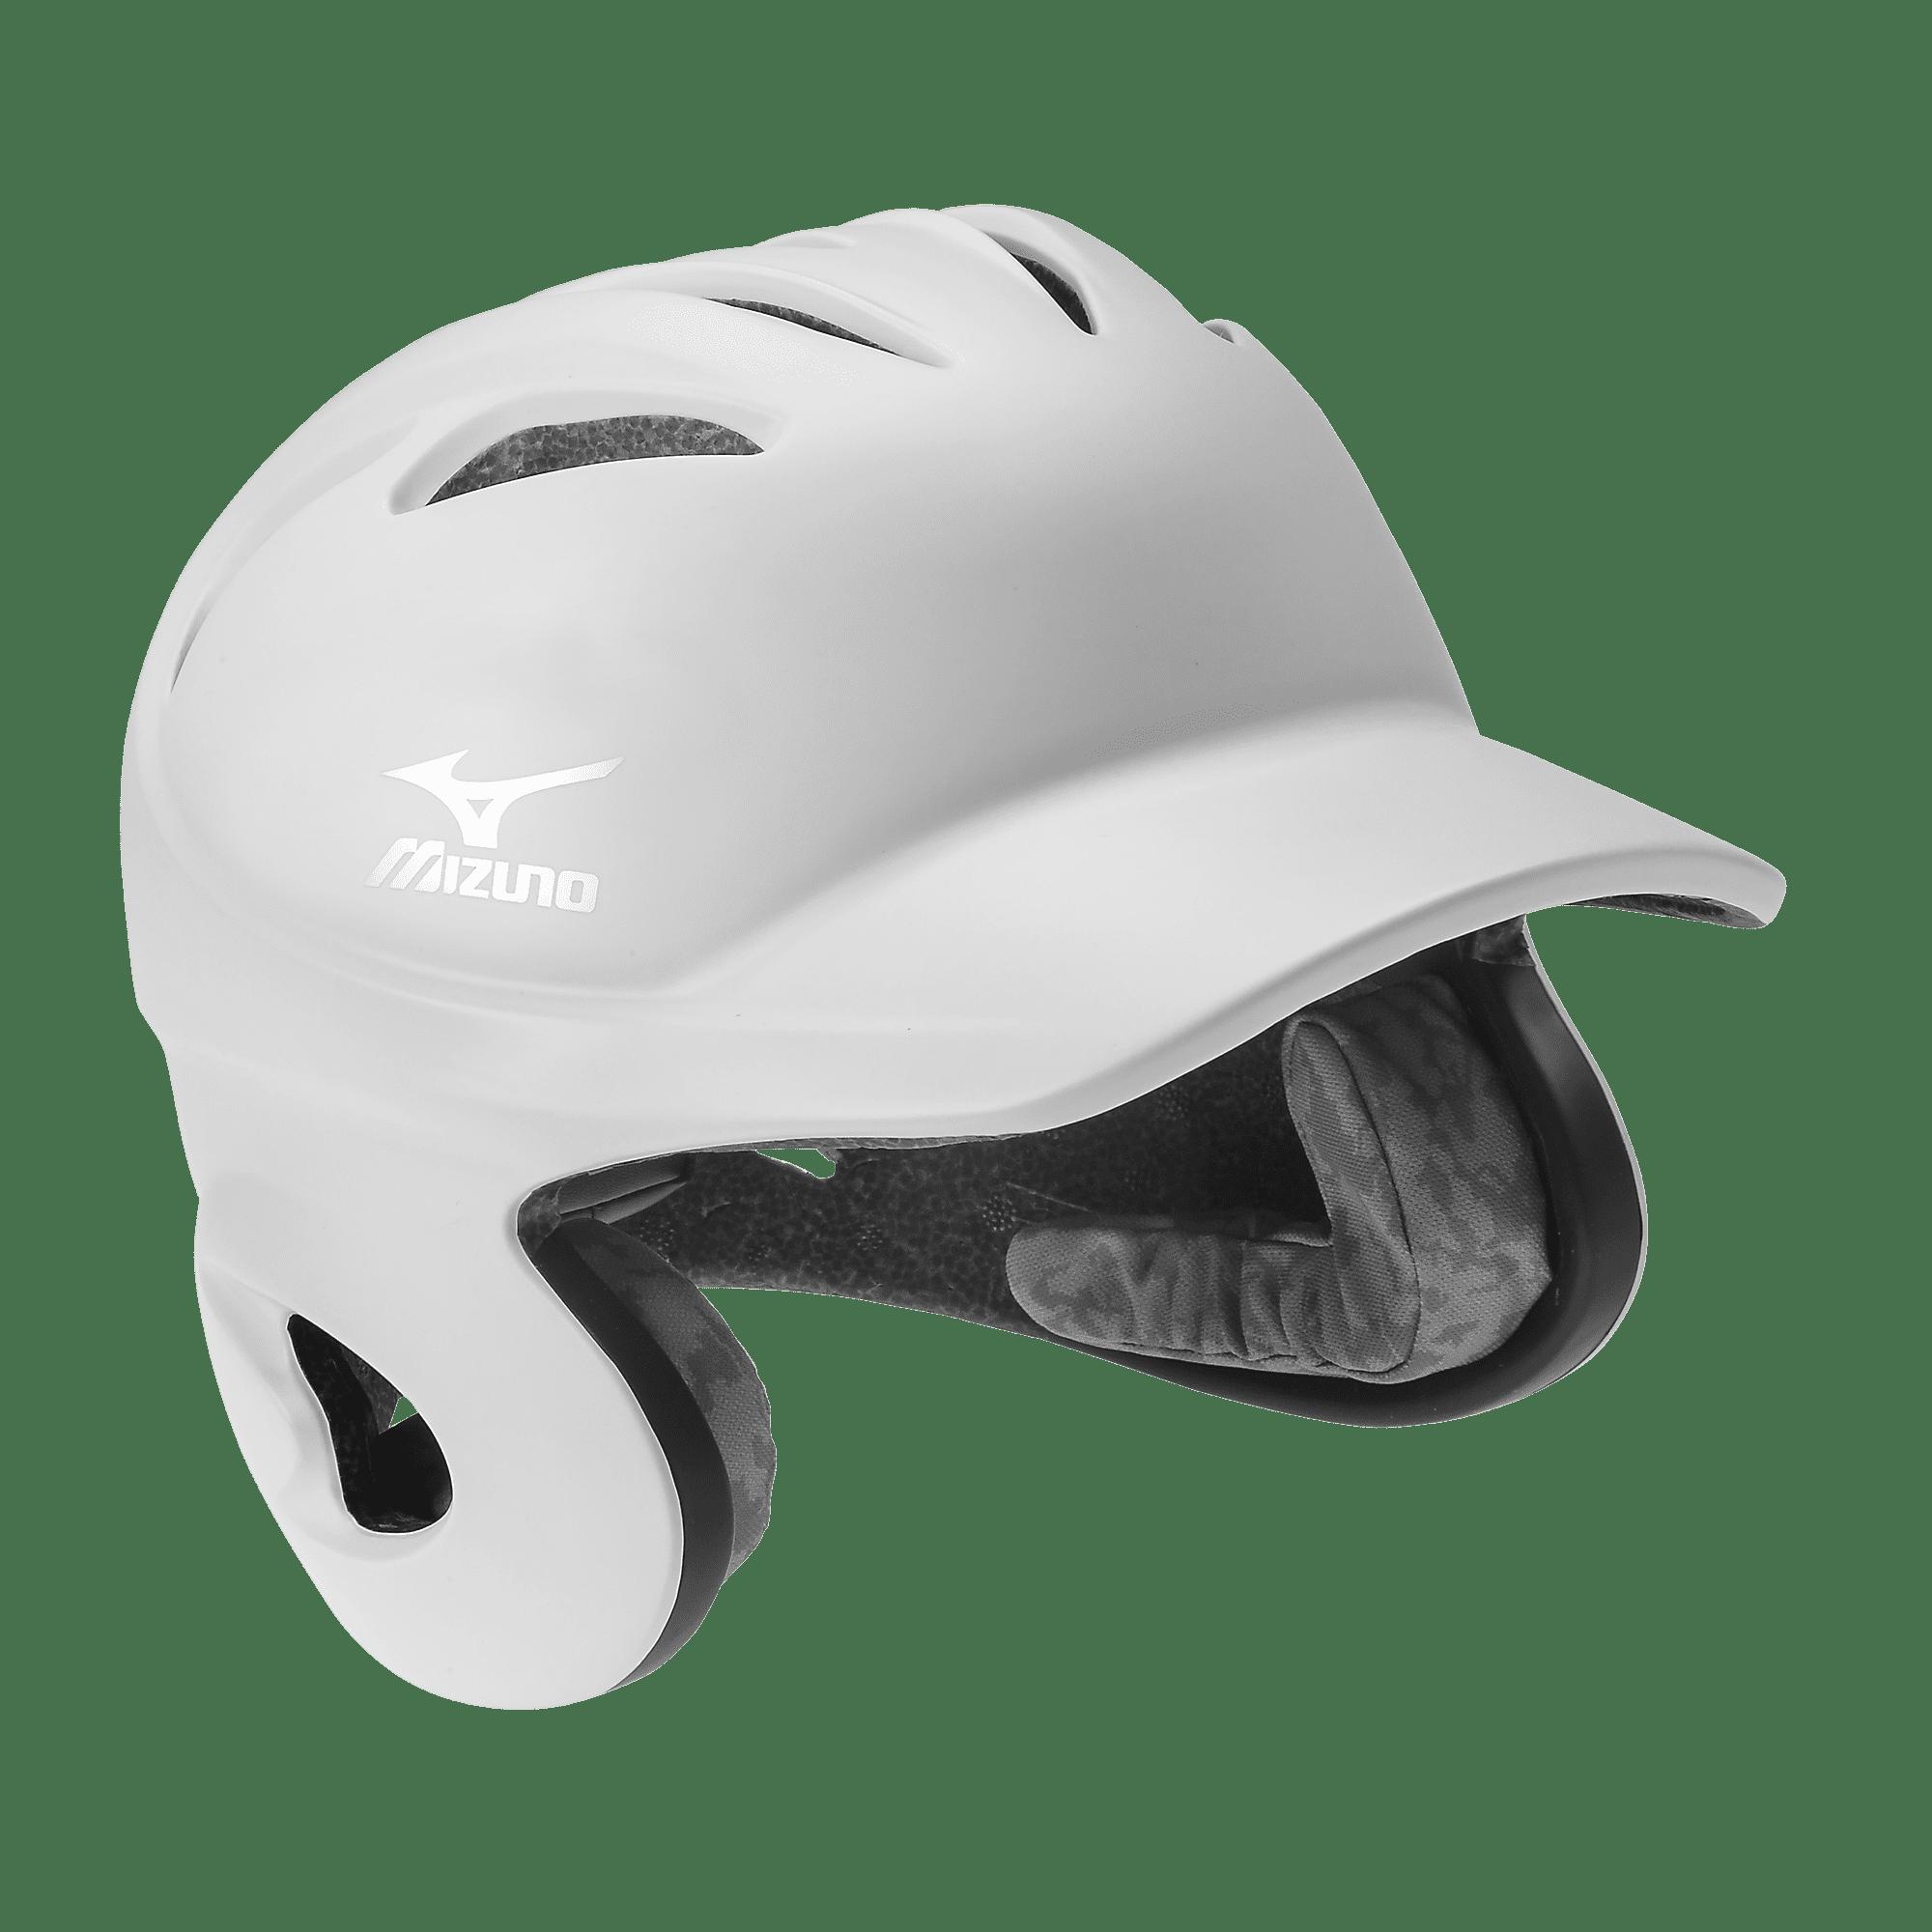 Mizuno Aerolite Fitted Batting Helmet